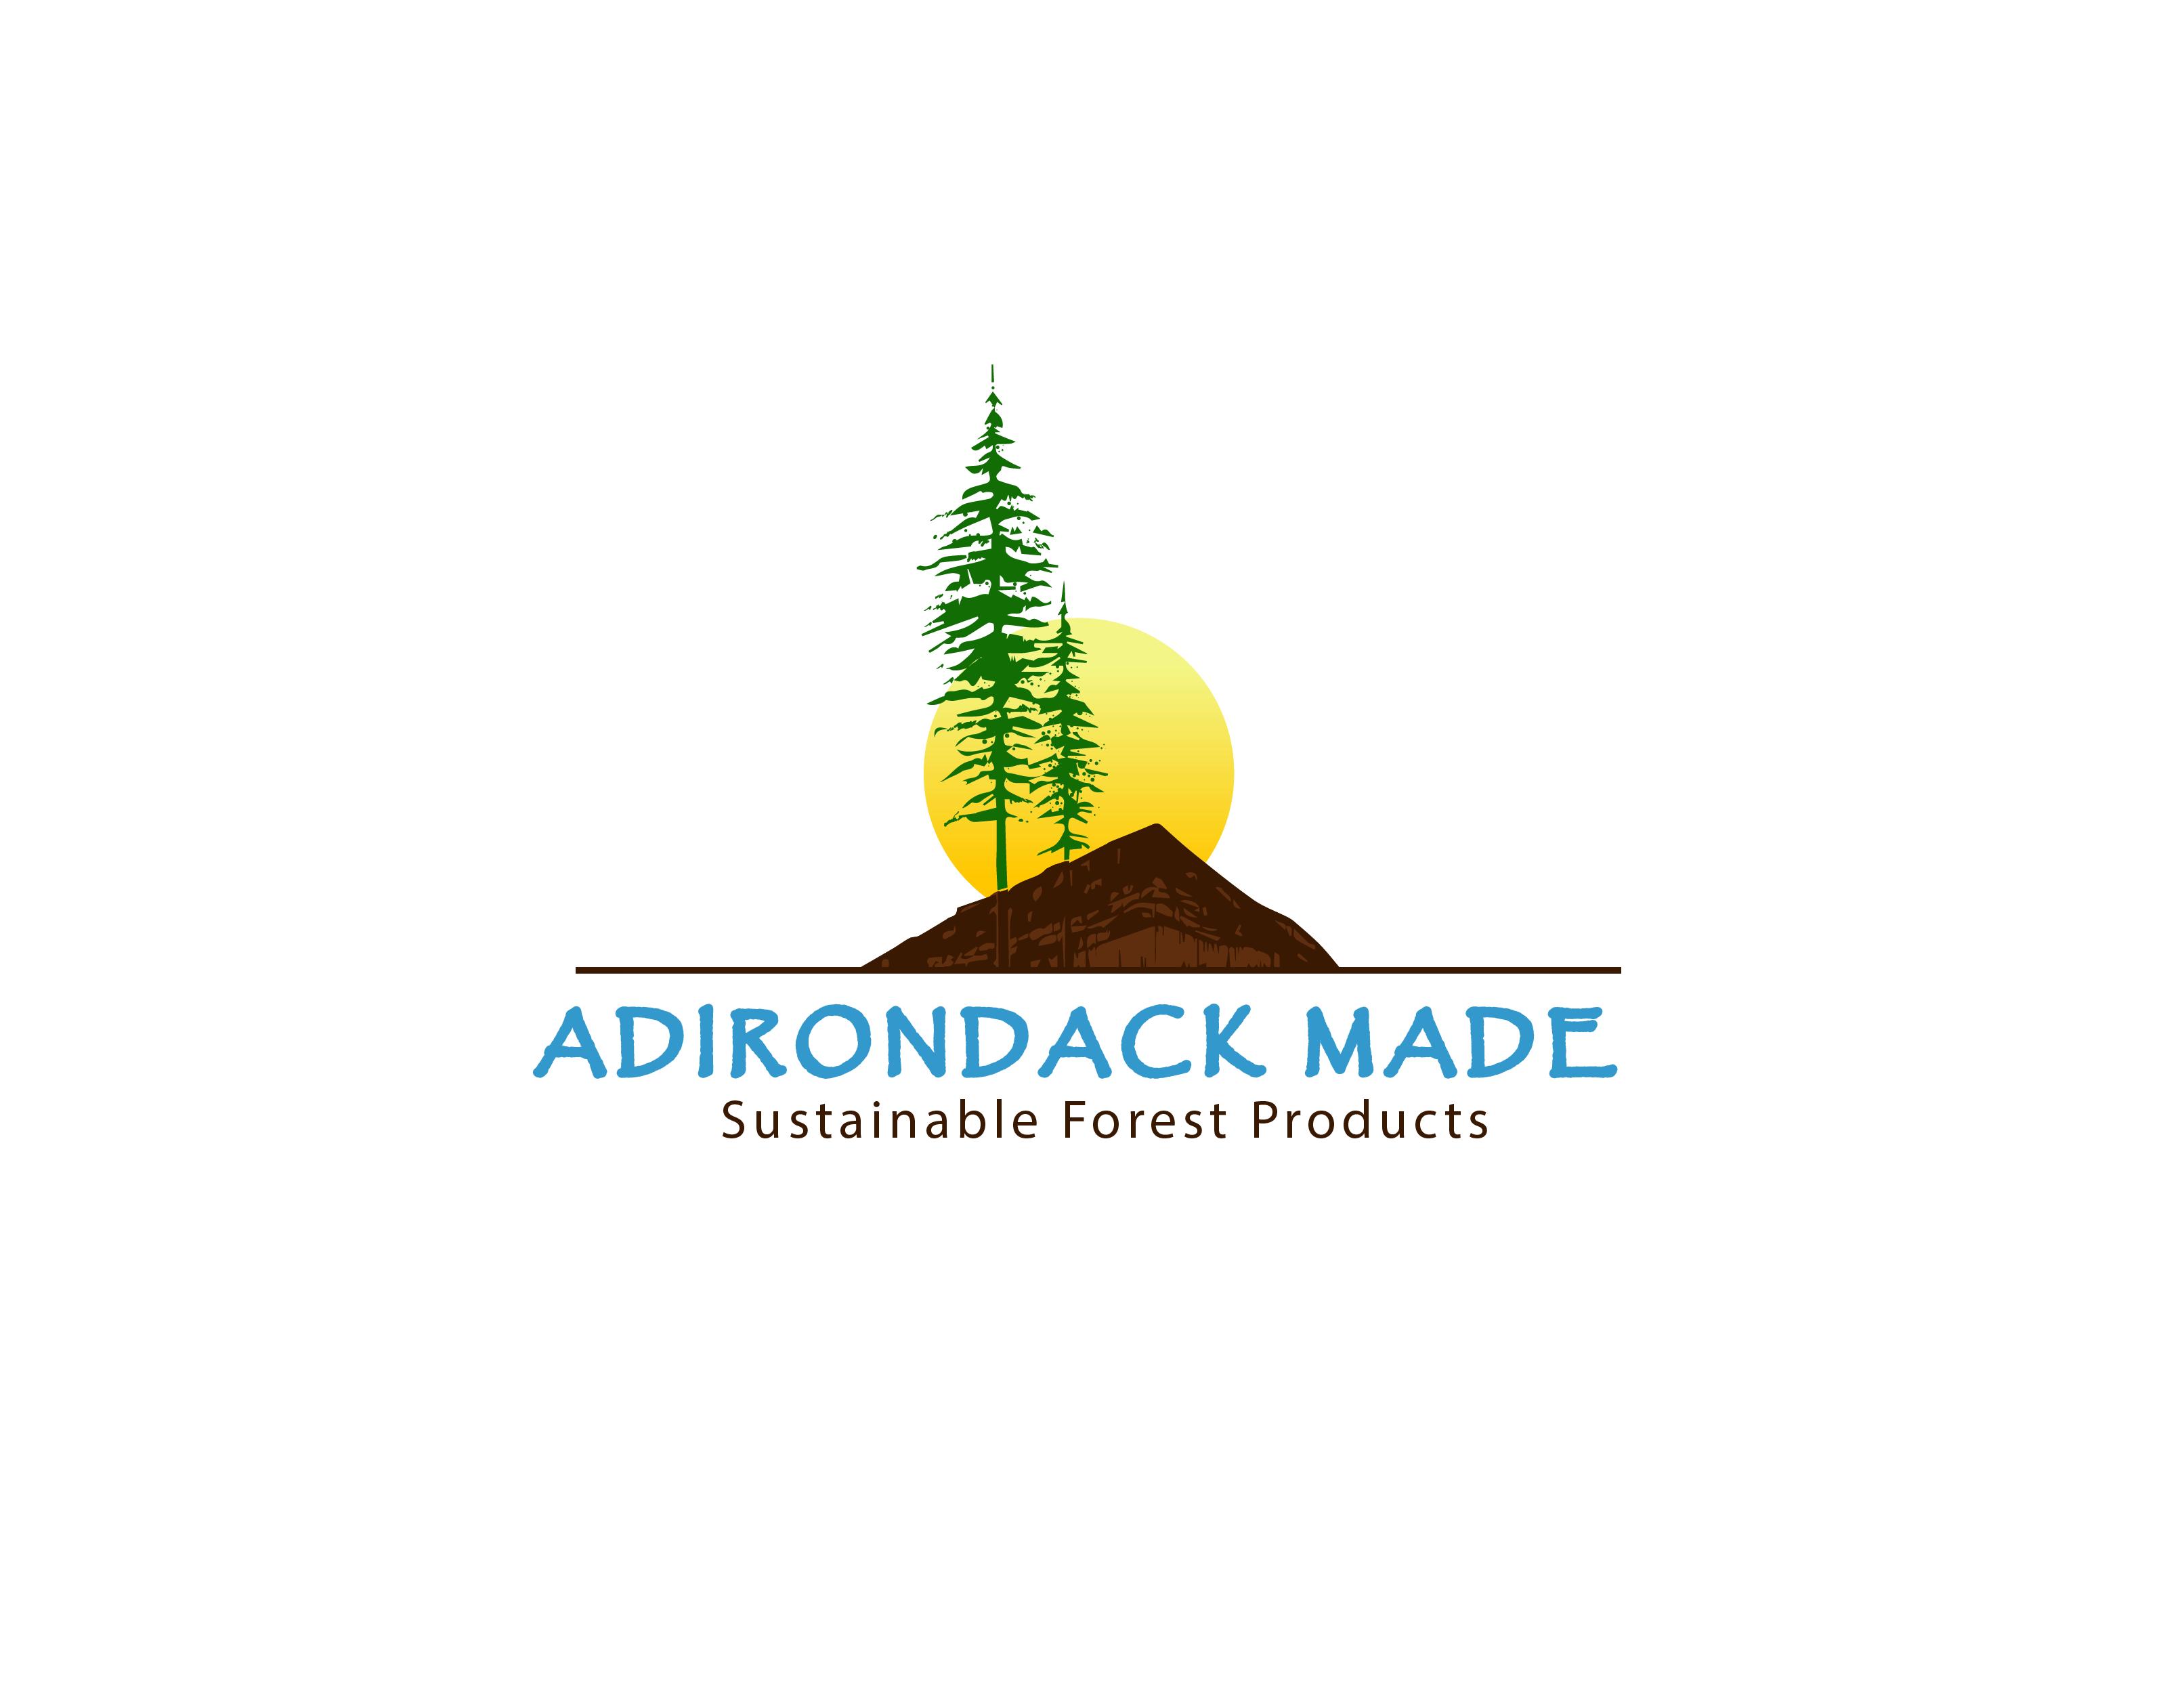 Adirondack Made